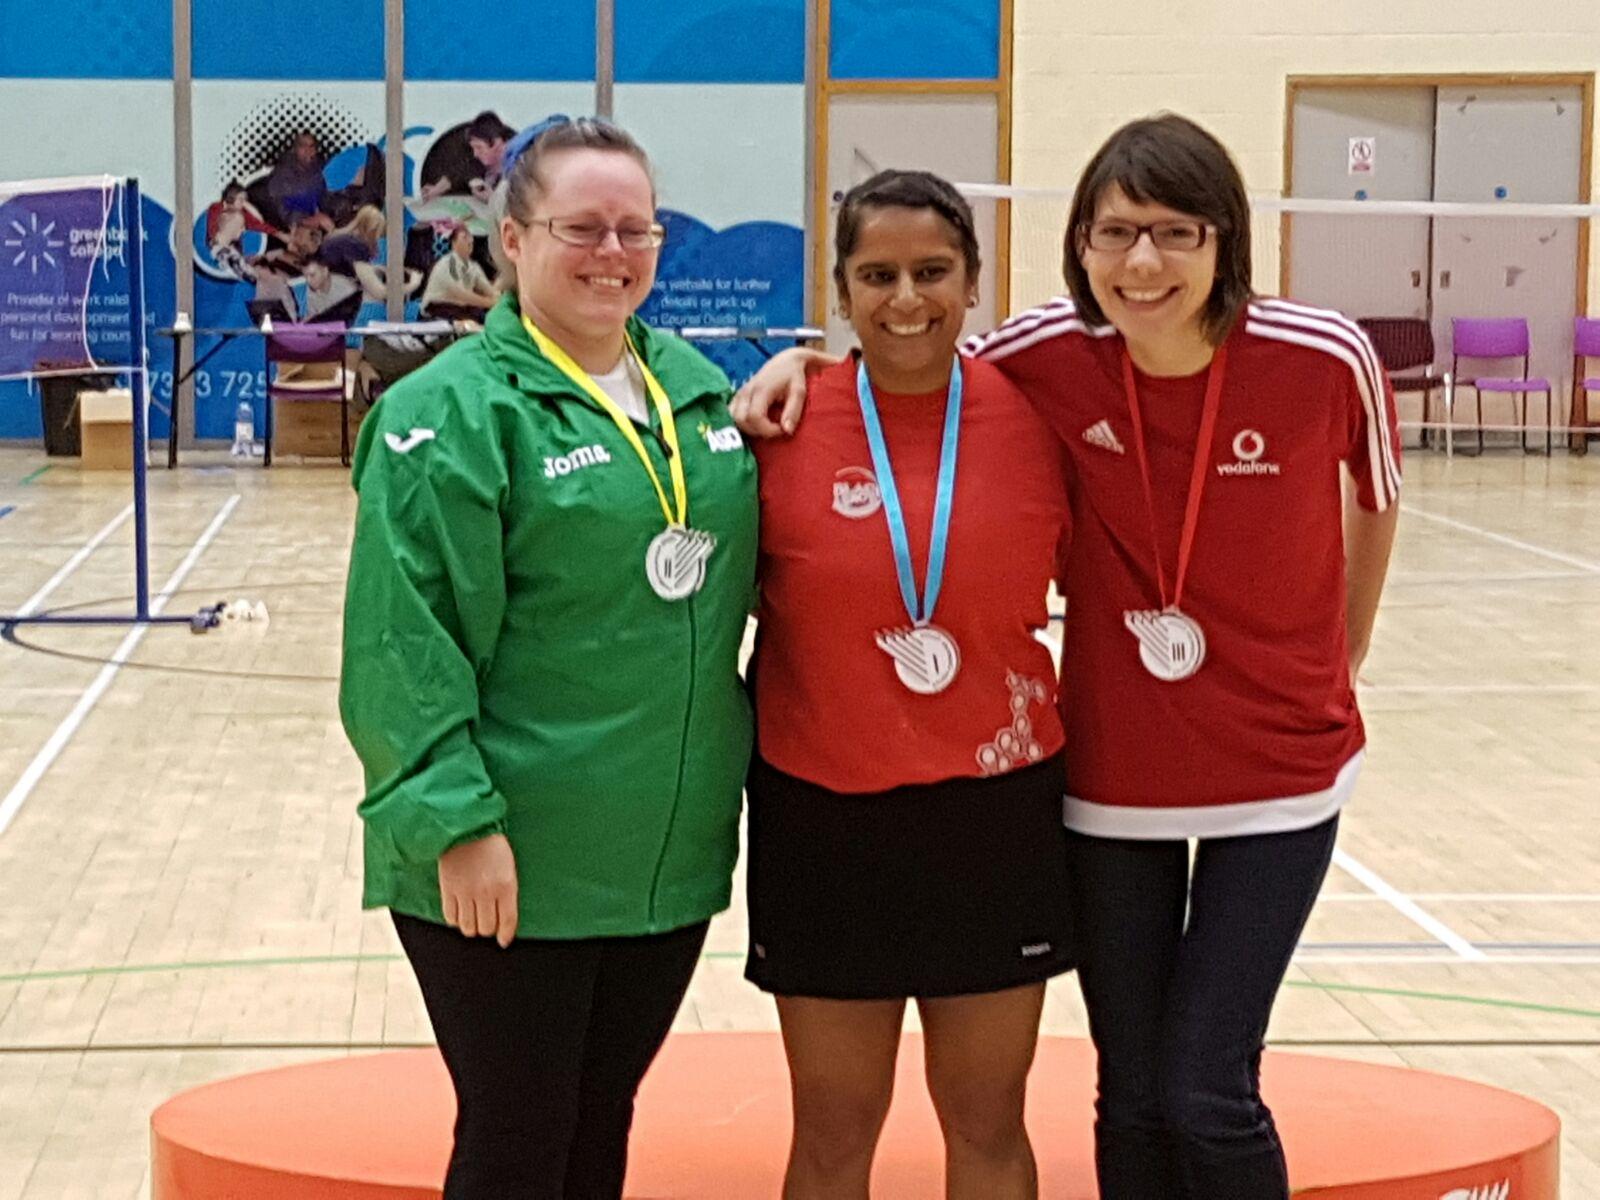 Women's Singles 30-39 (l_R) Sam Stow (2nd) Amardeep Panesar (1st) & Anca Ferent (3rd)